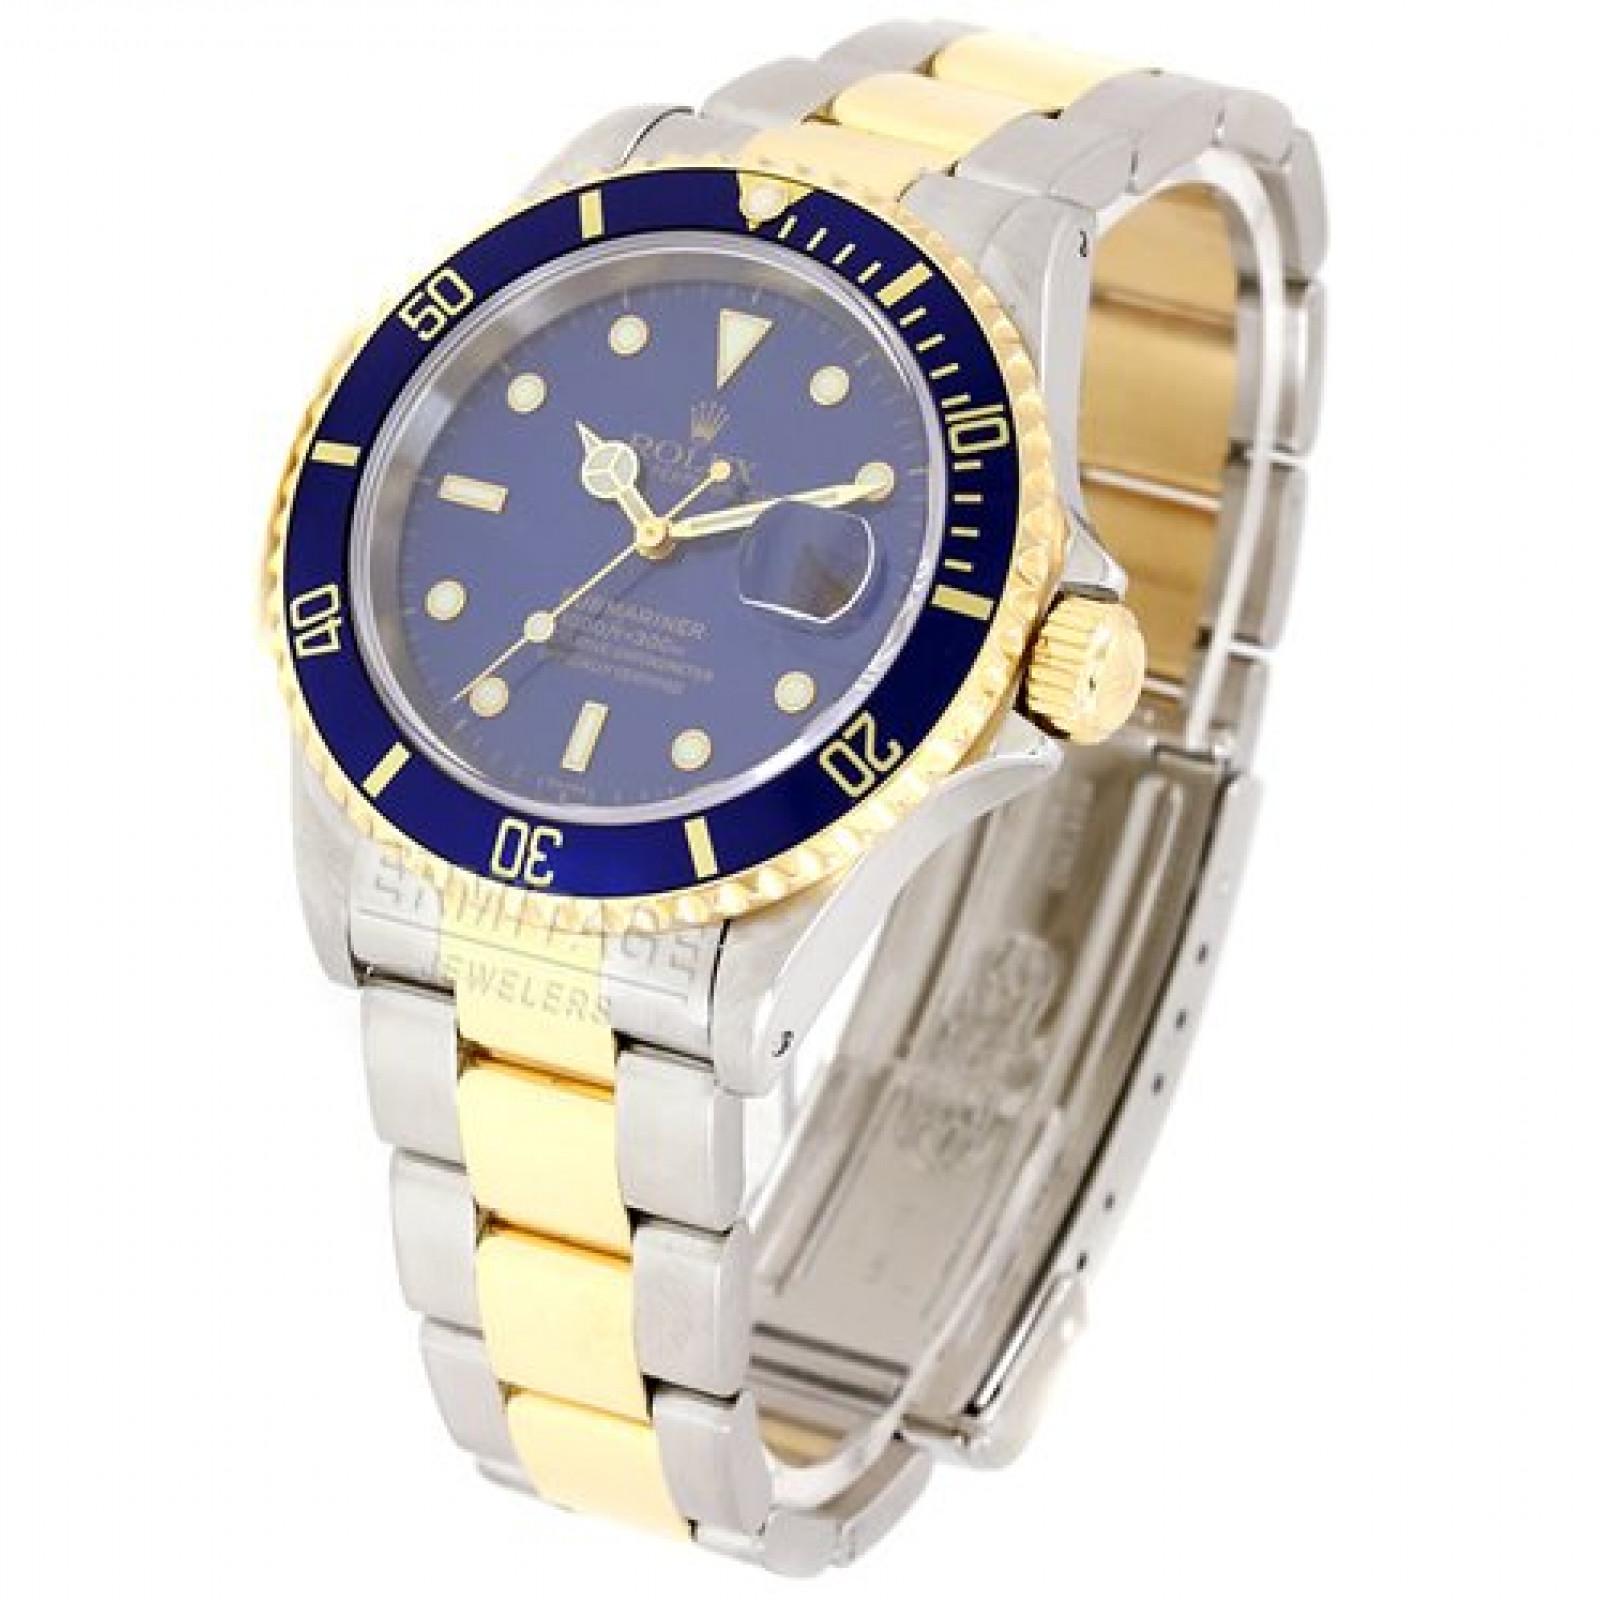 Rolex Submariner 16613 Gold & Steel 1999 Single